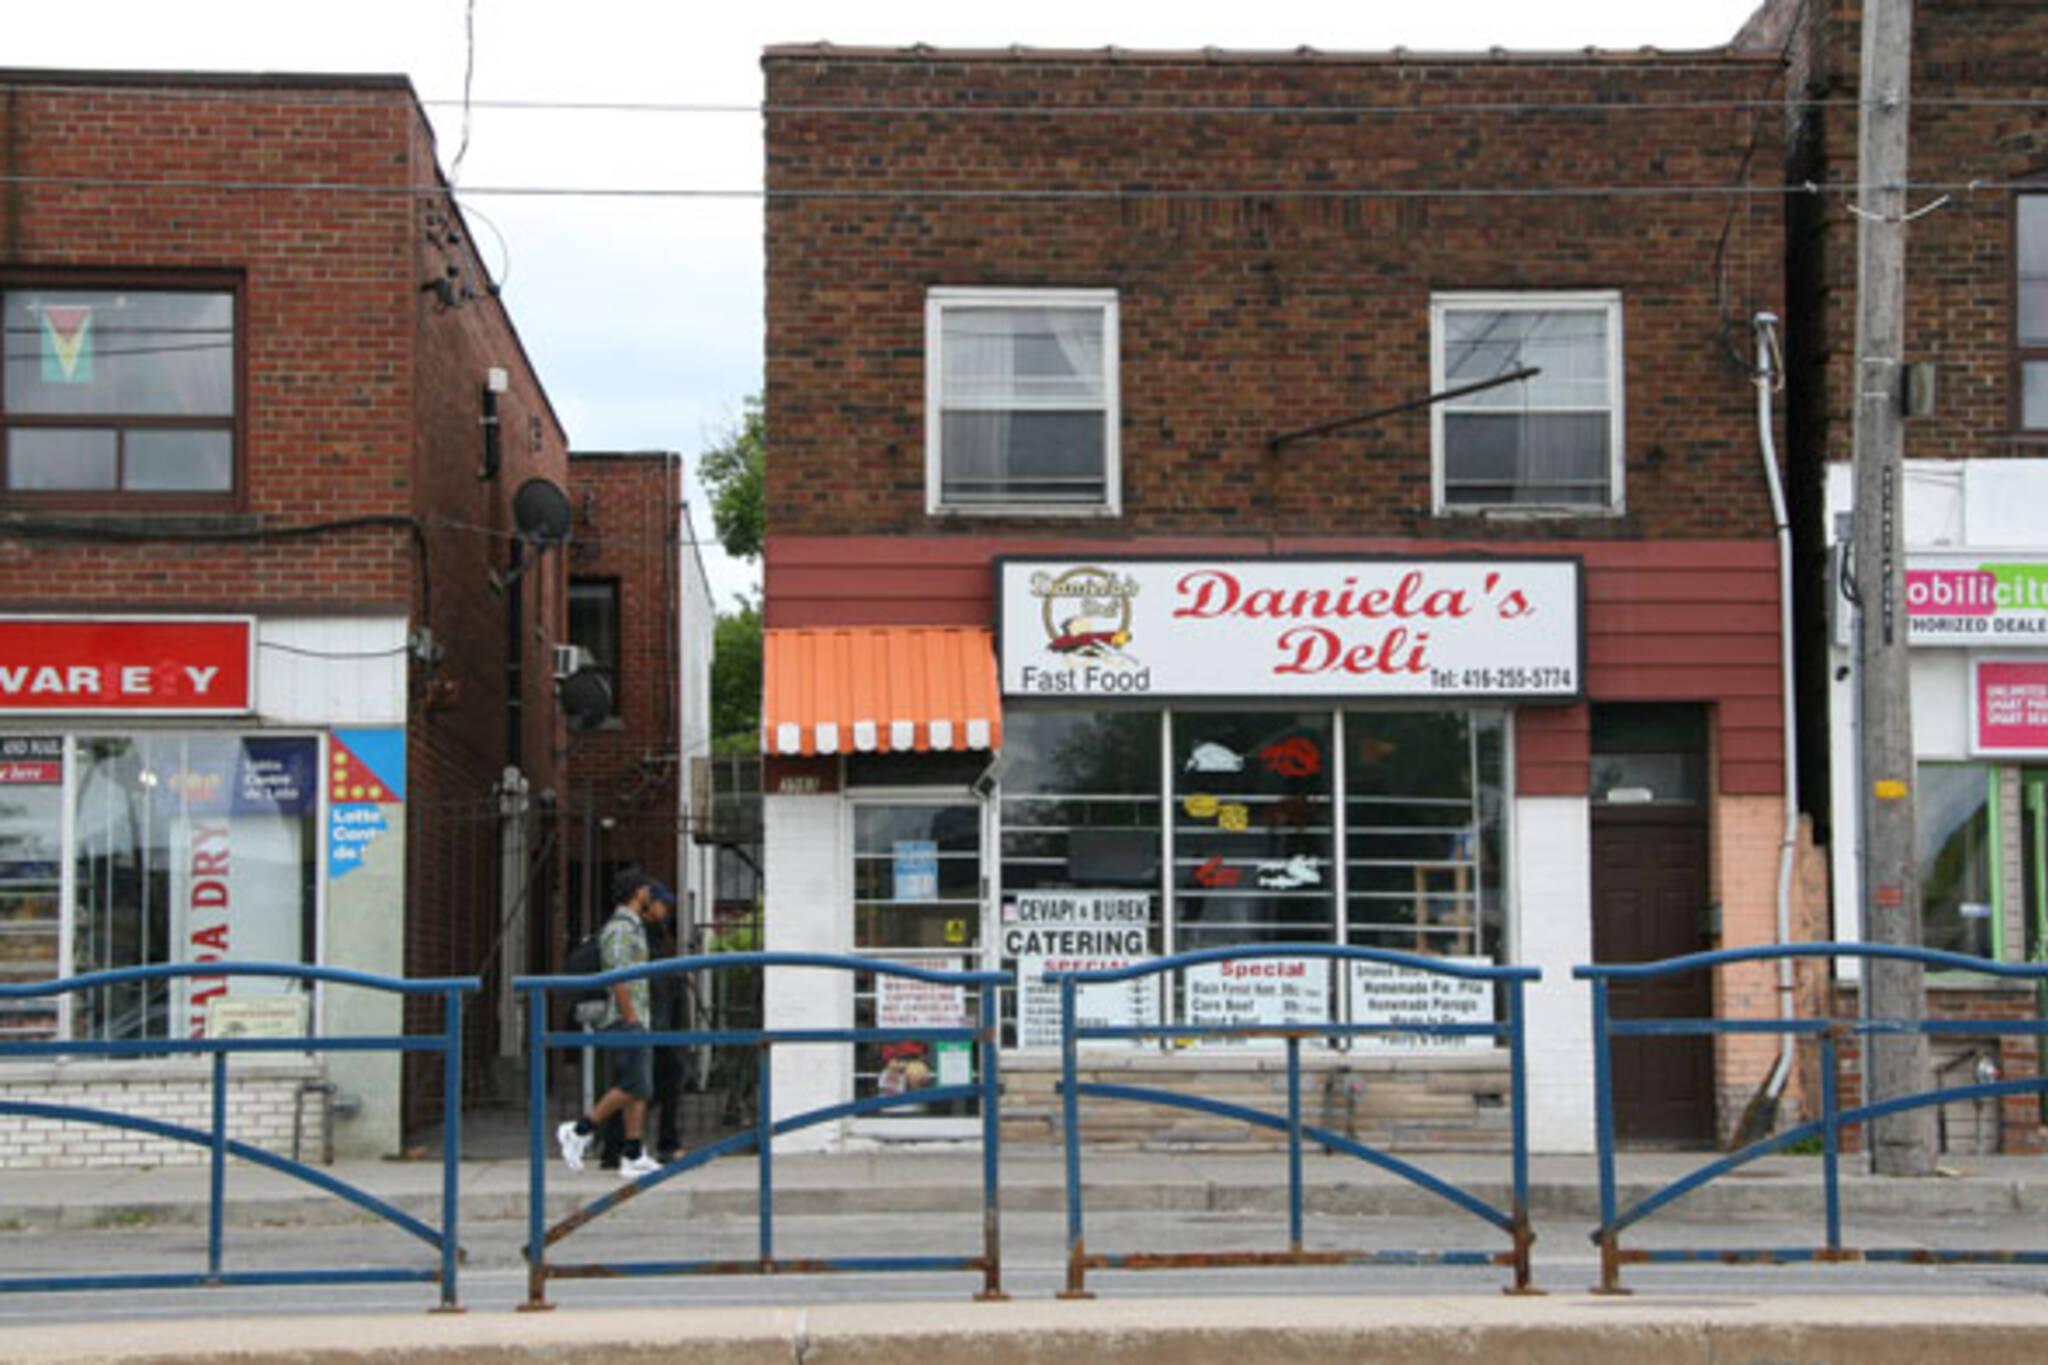 Daniela's Deli Toronto